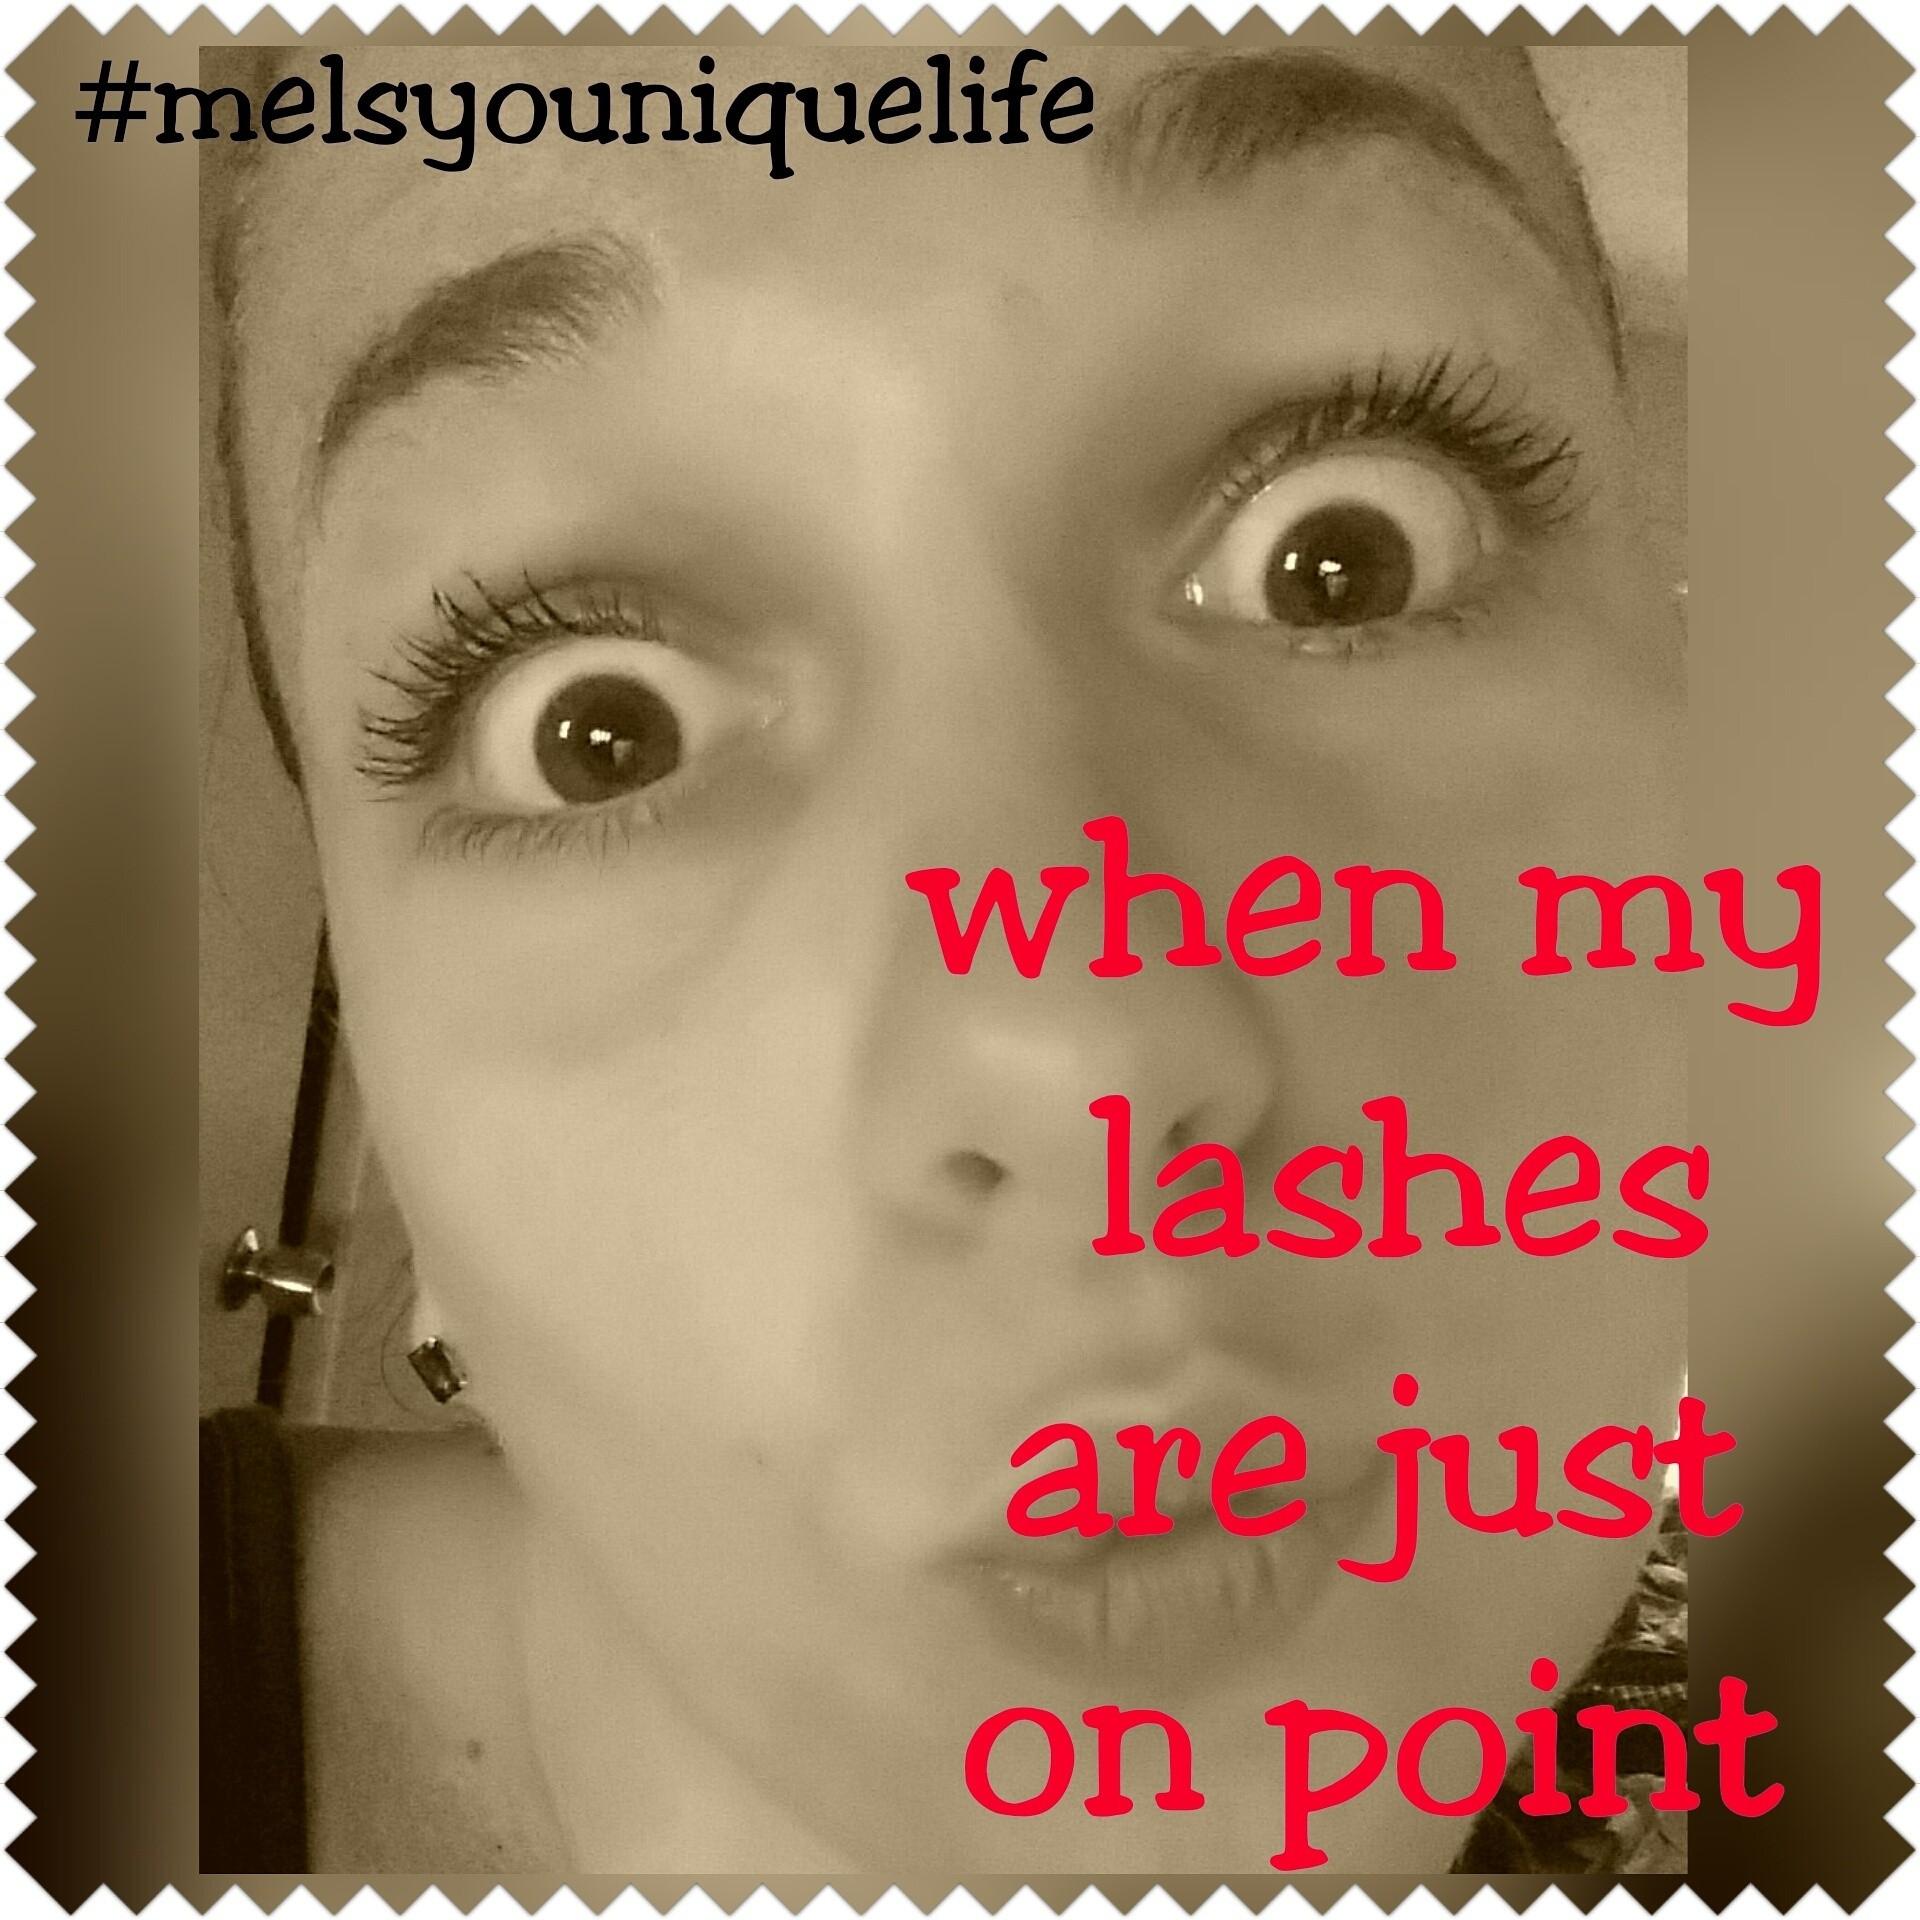 #mummyonamission #melsyouniquelife #ilovemakeup #cairns #cairnsgirl #cairnslife #eyes